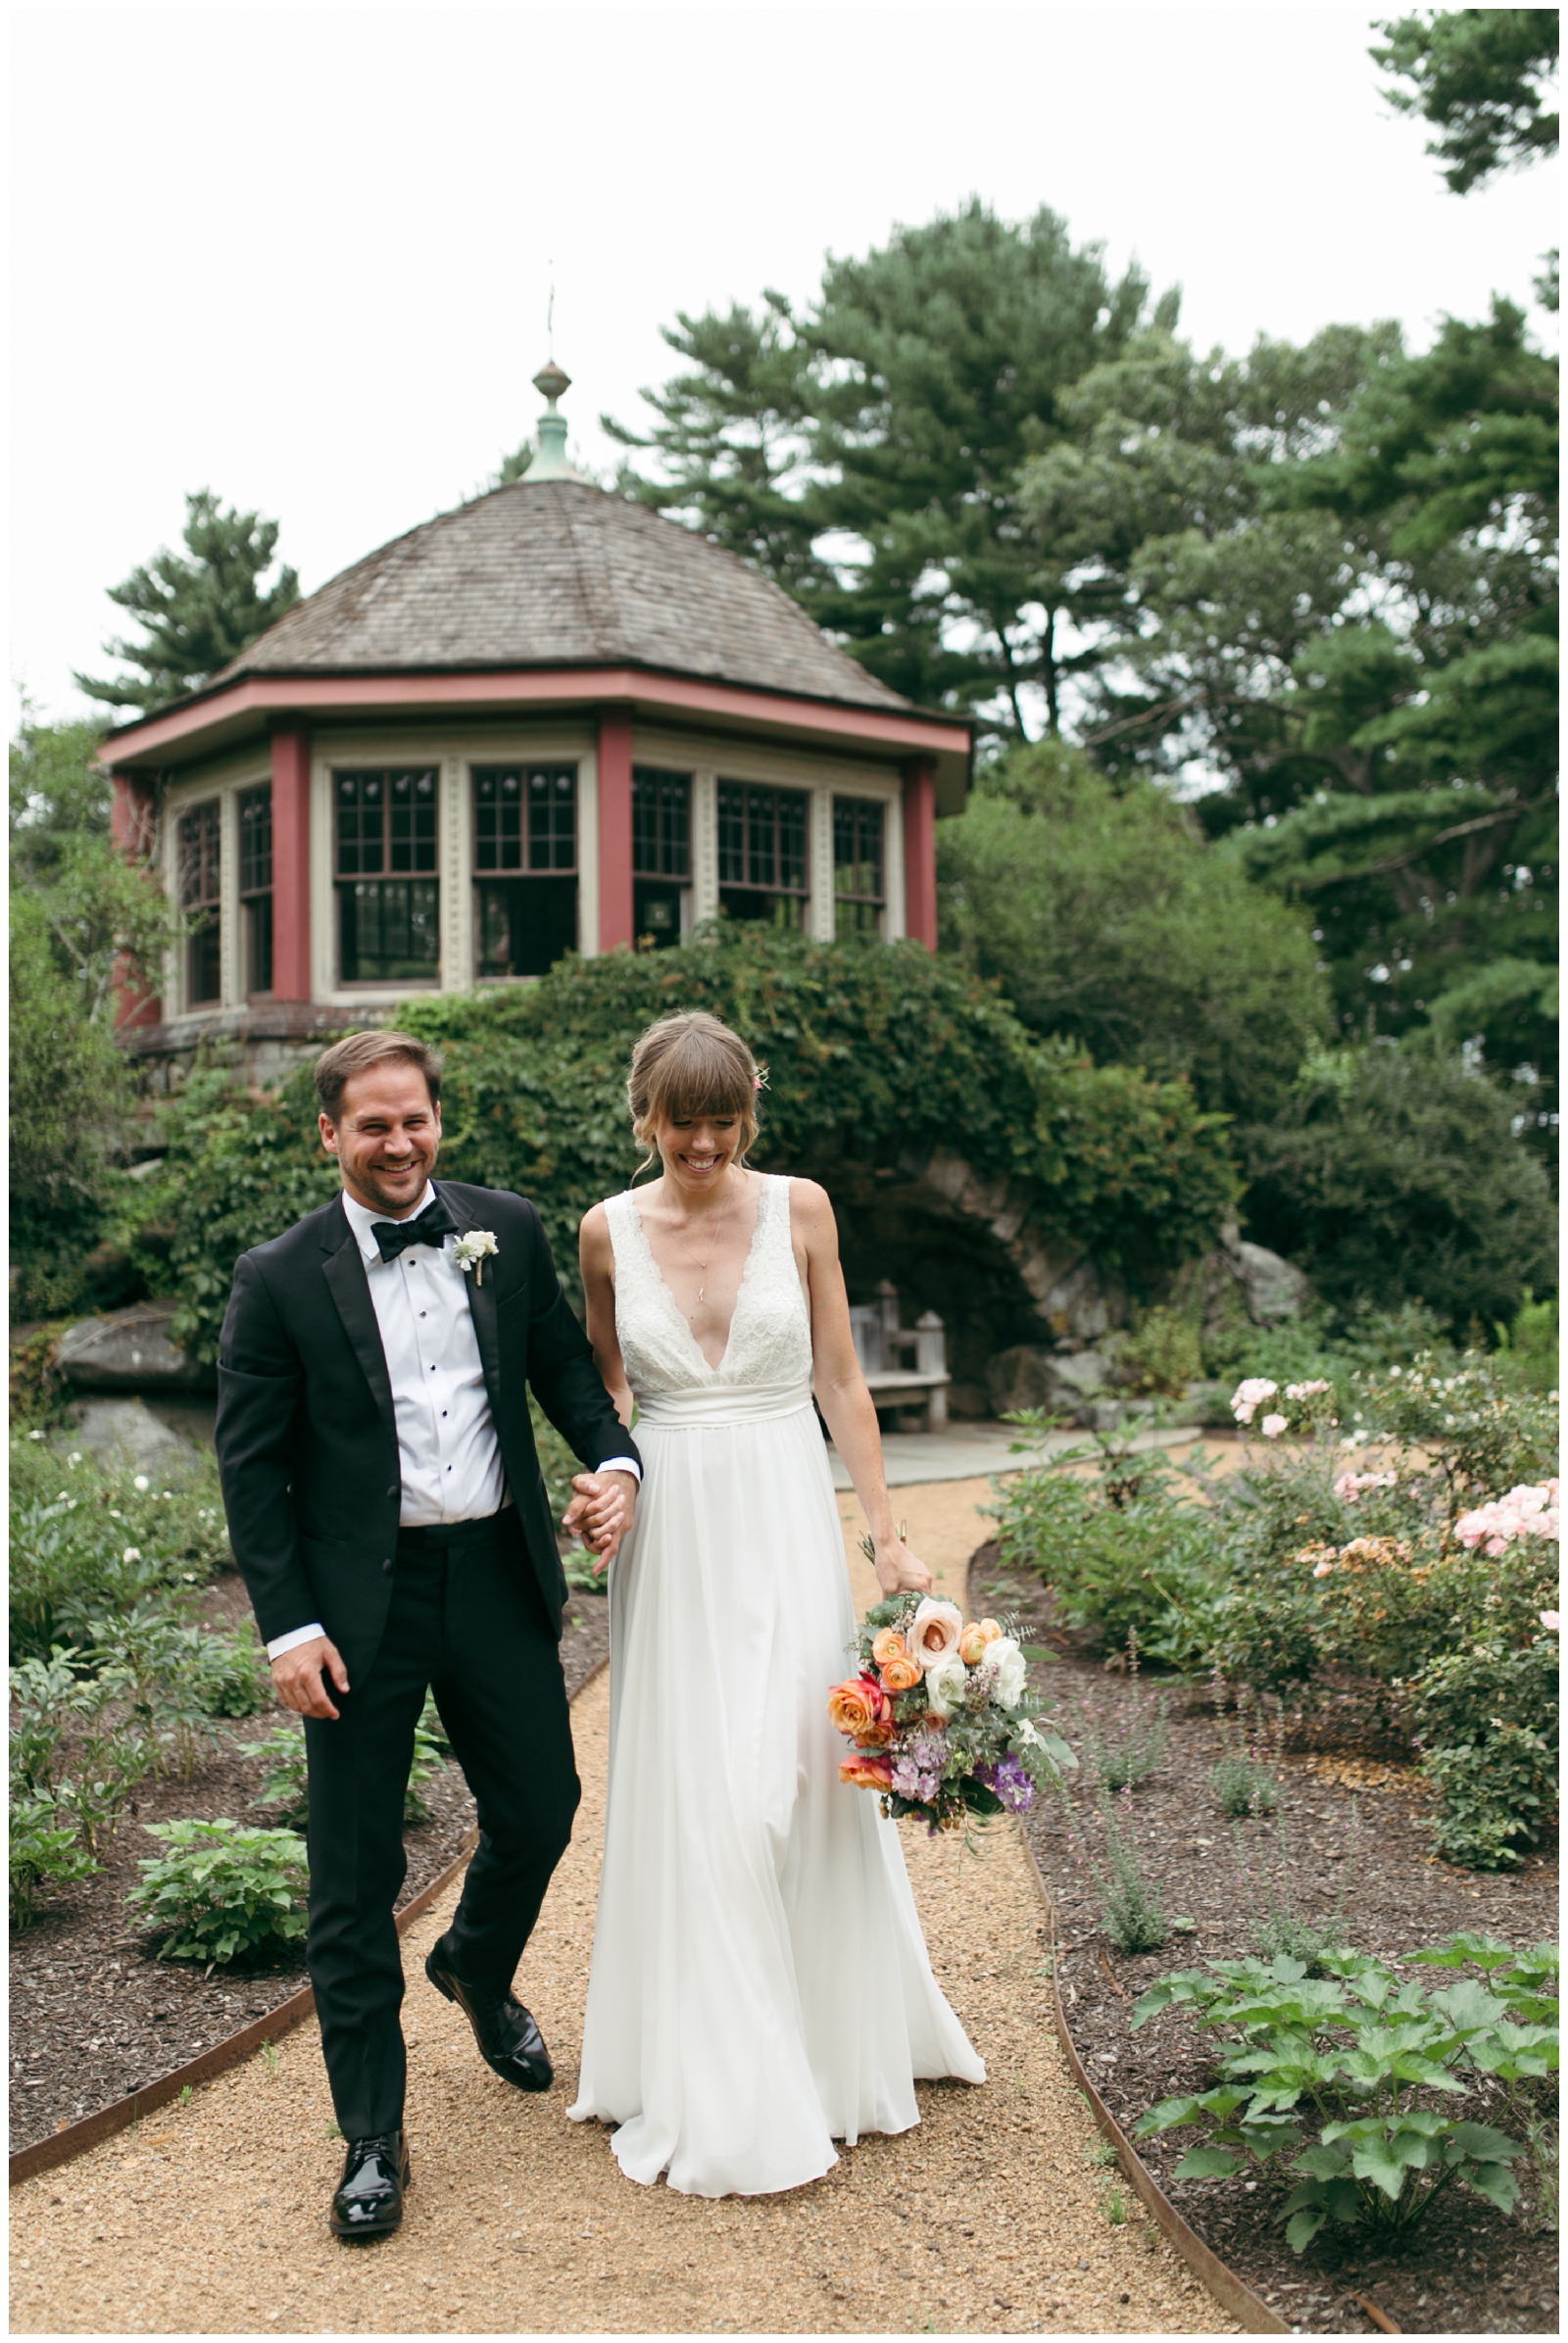 Moraine-Farm-wedding-Bailey-Q-Photo-Massachusetts-wedding-photpgrapher-026.jpg